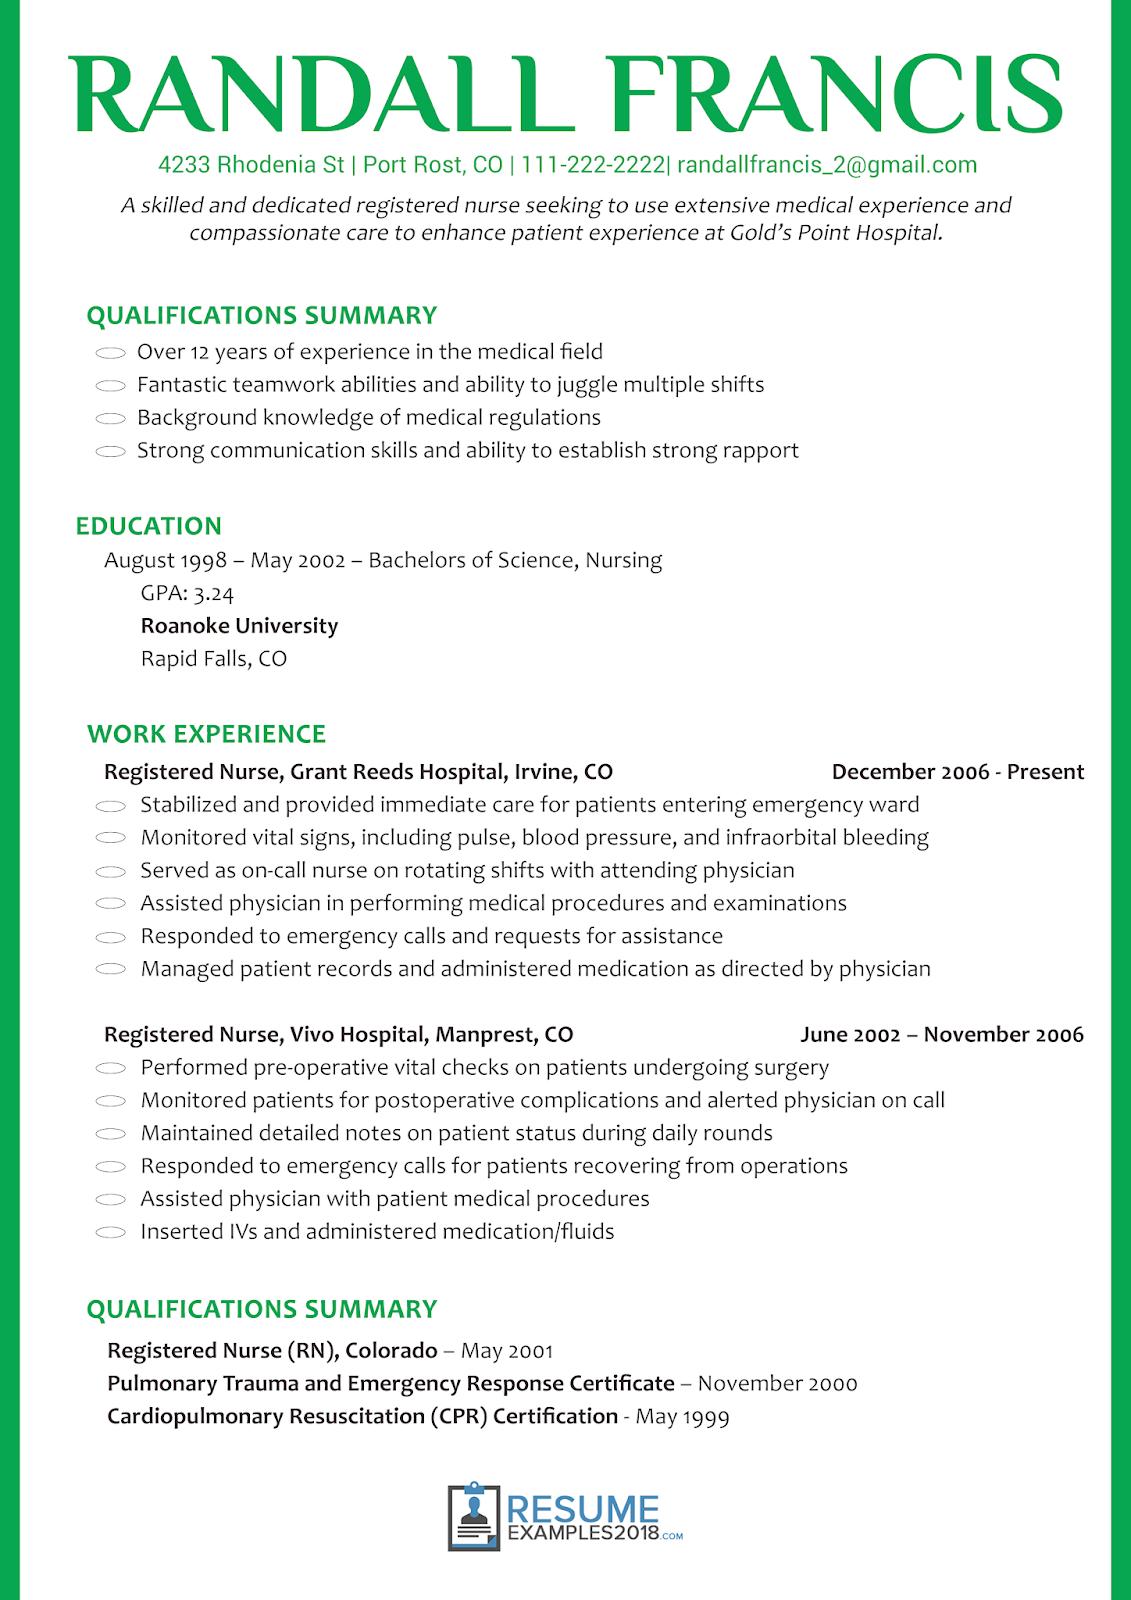 nursing resume examples, nursing resume examples 2019, nursing resume examples new grad, nursing resume examples 2018 pdf, nursing resume examples australia, nursing resume examples entry level, nursing resume examples for new graduates, nursing resume examples lpn,